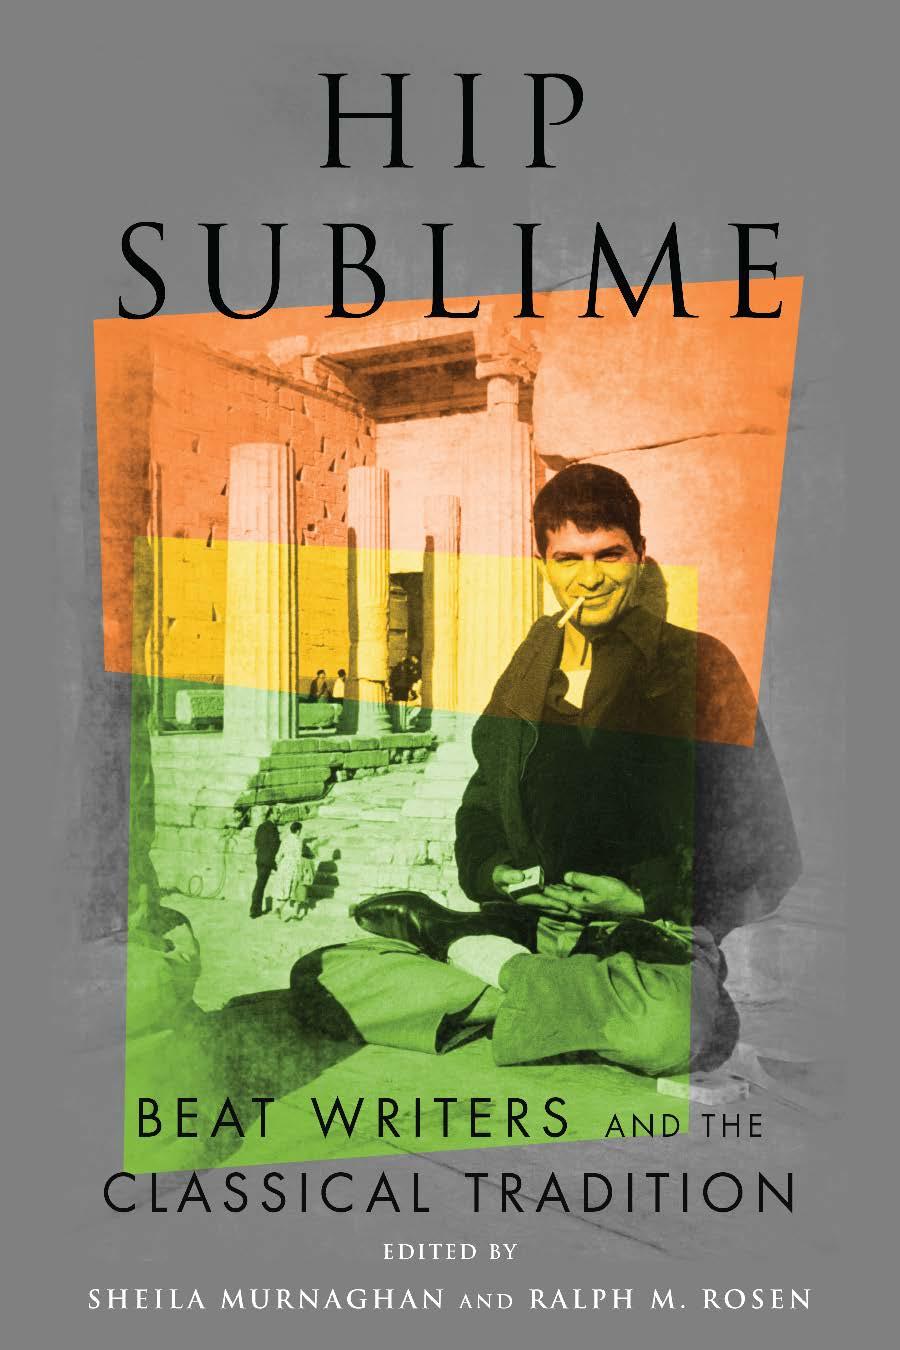 Review: Hip Sublime